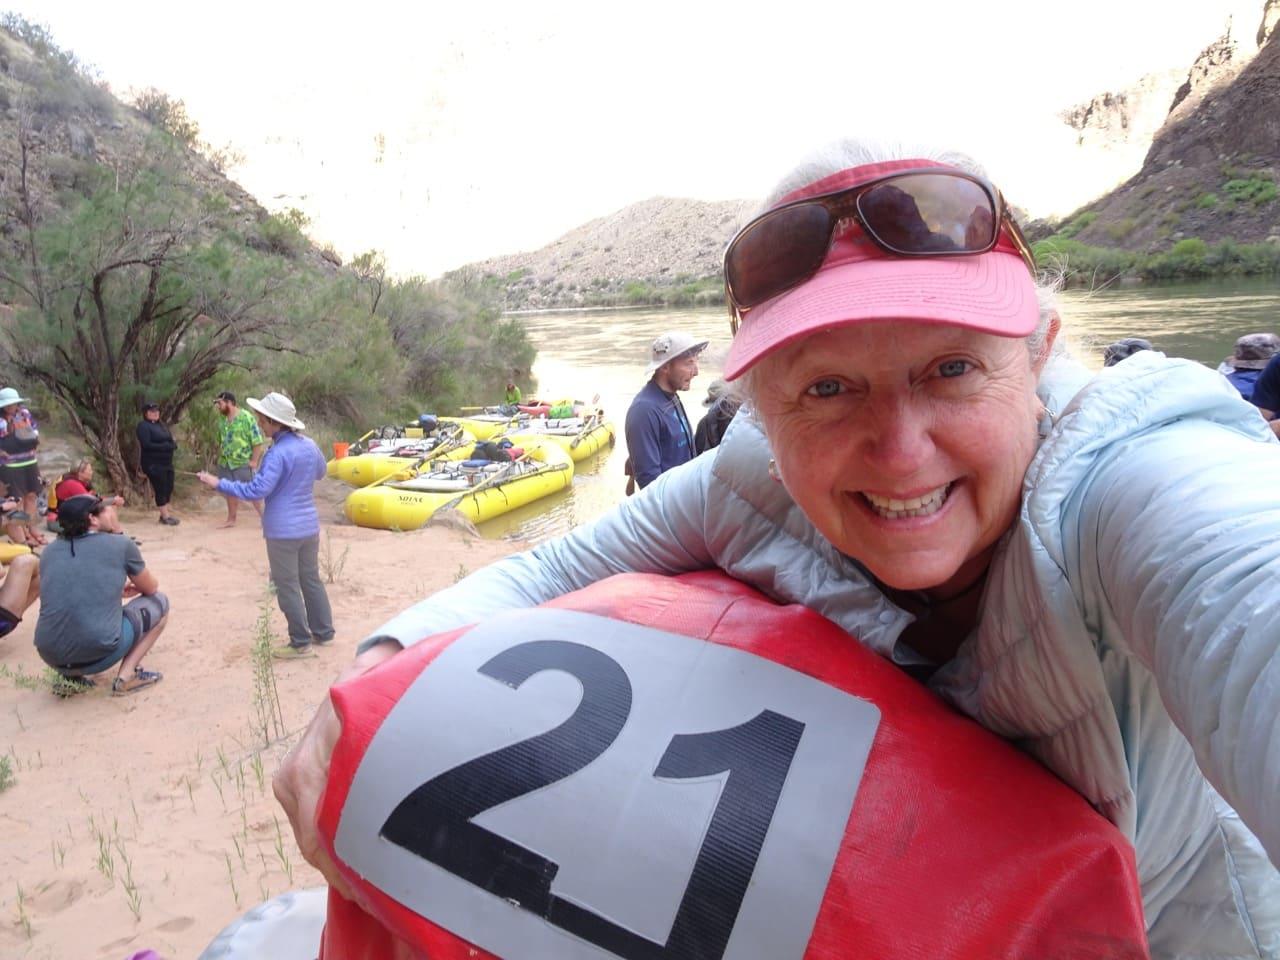 sw-parks-western-river-expeditions-melanie's-dry-bag-colorado-river-trip